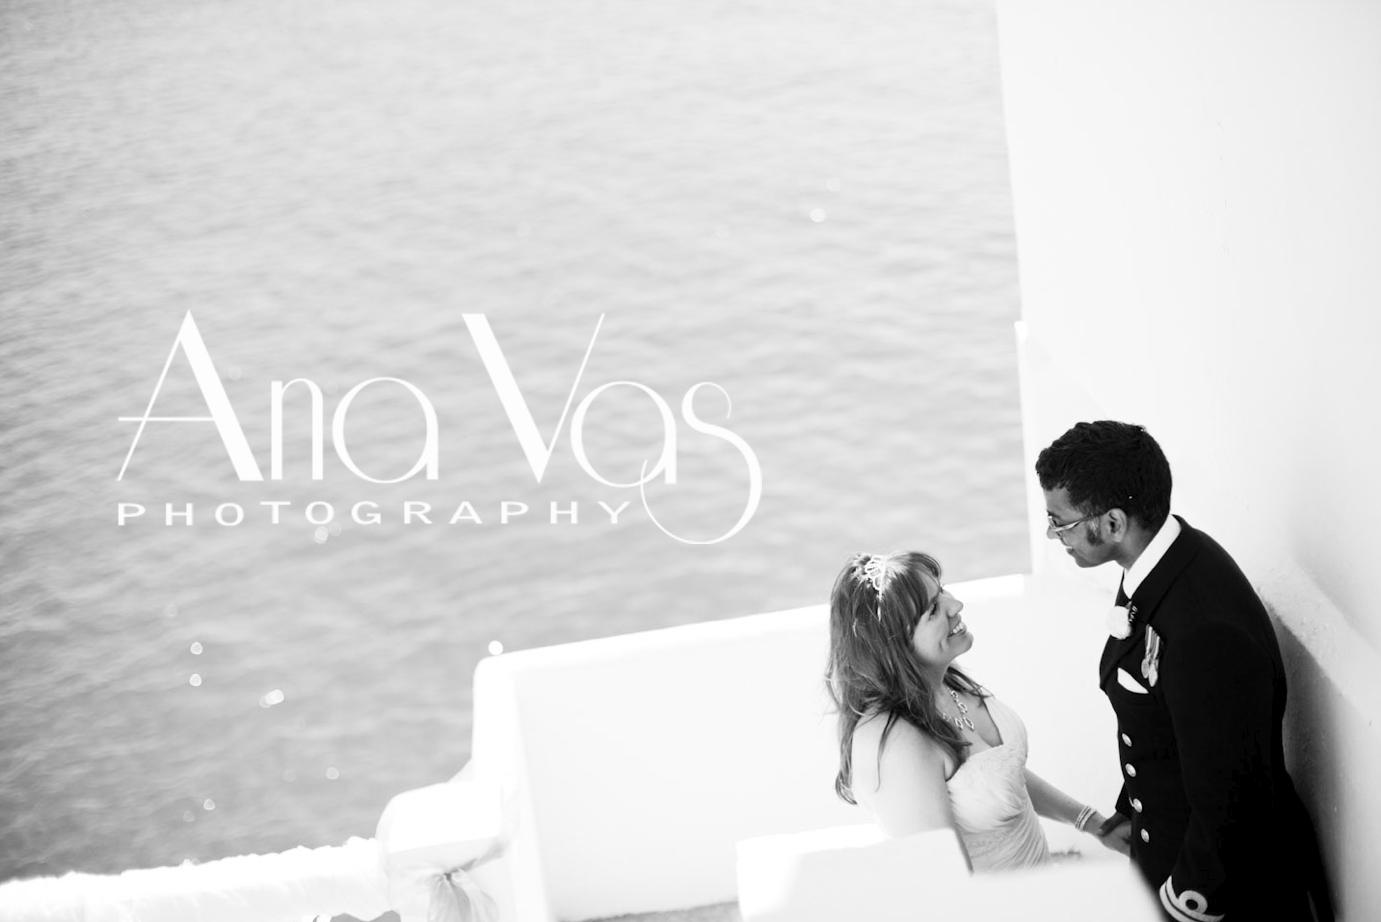 Claire & Paul's Wedding at the Caleta Hotel, Gibraltar